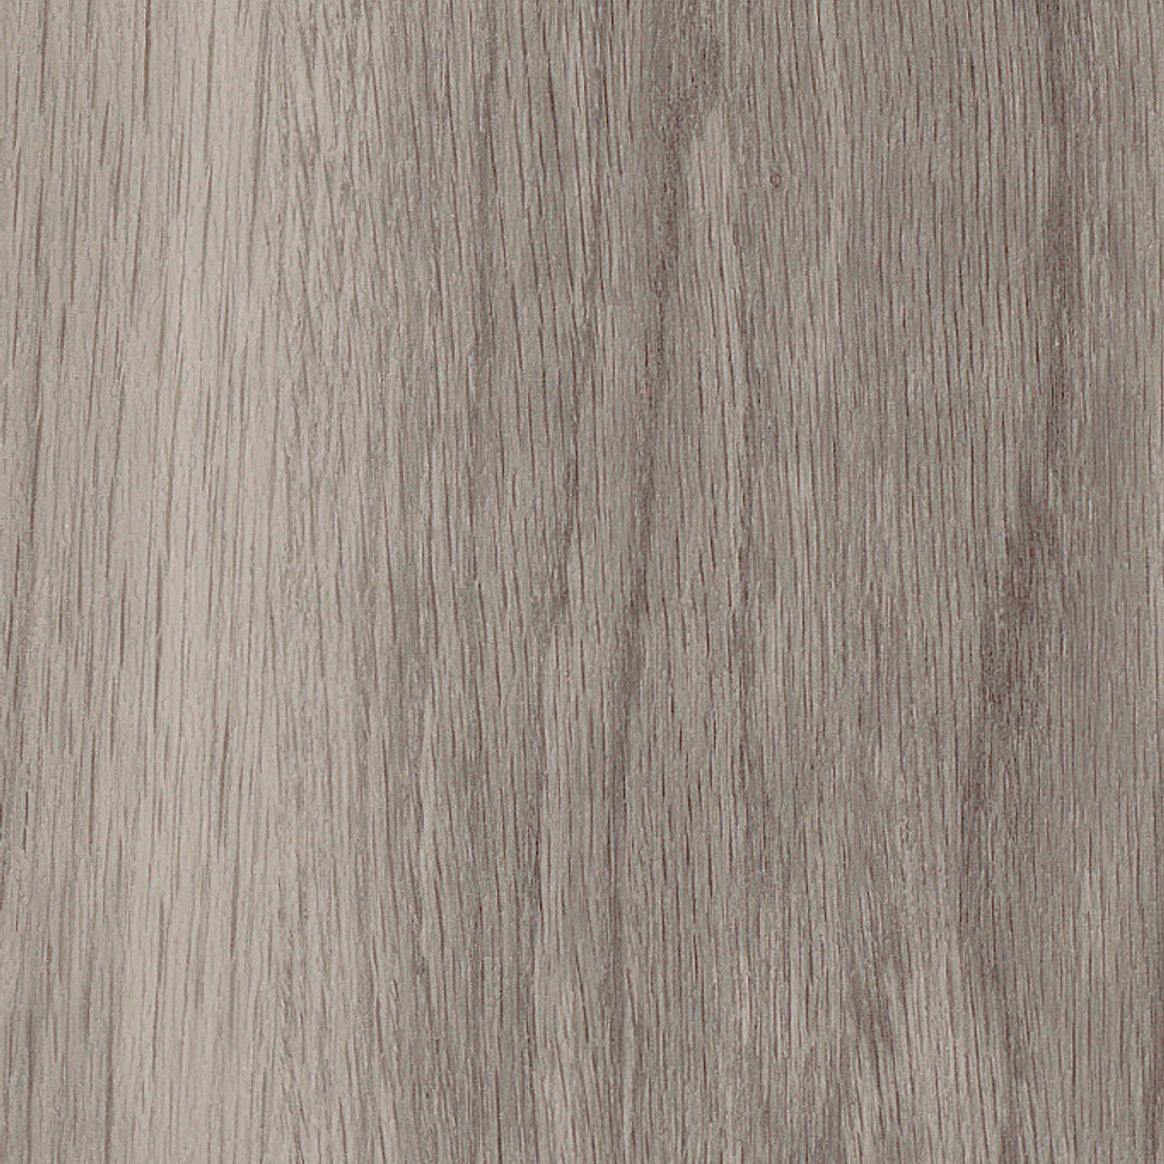 Nordic Oak thumbnail